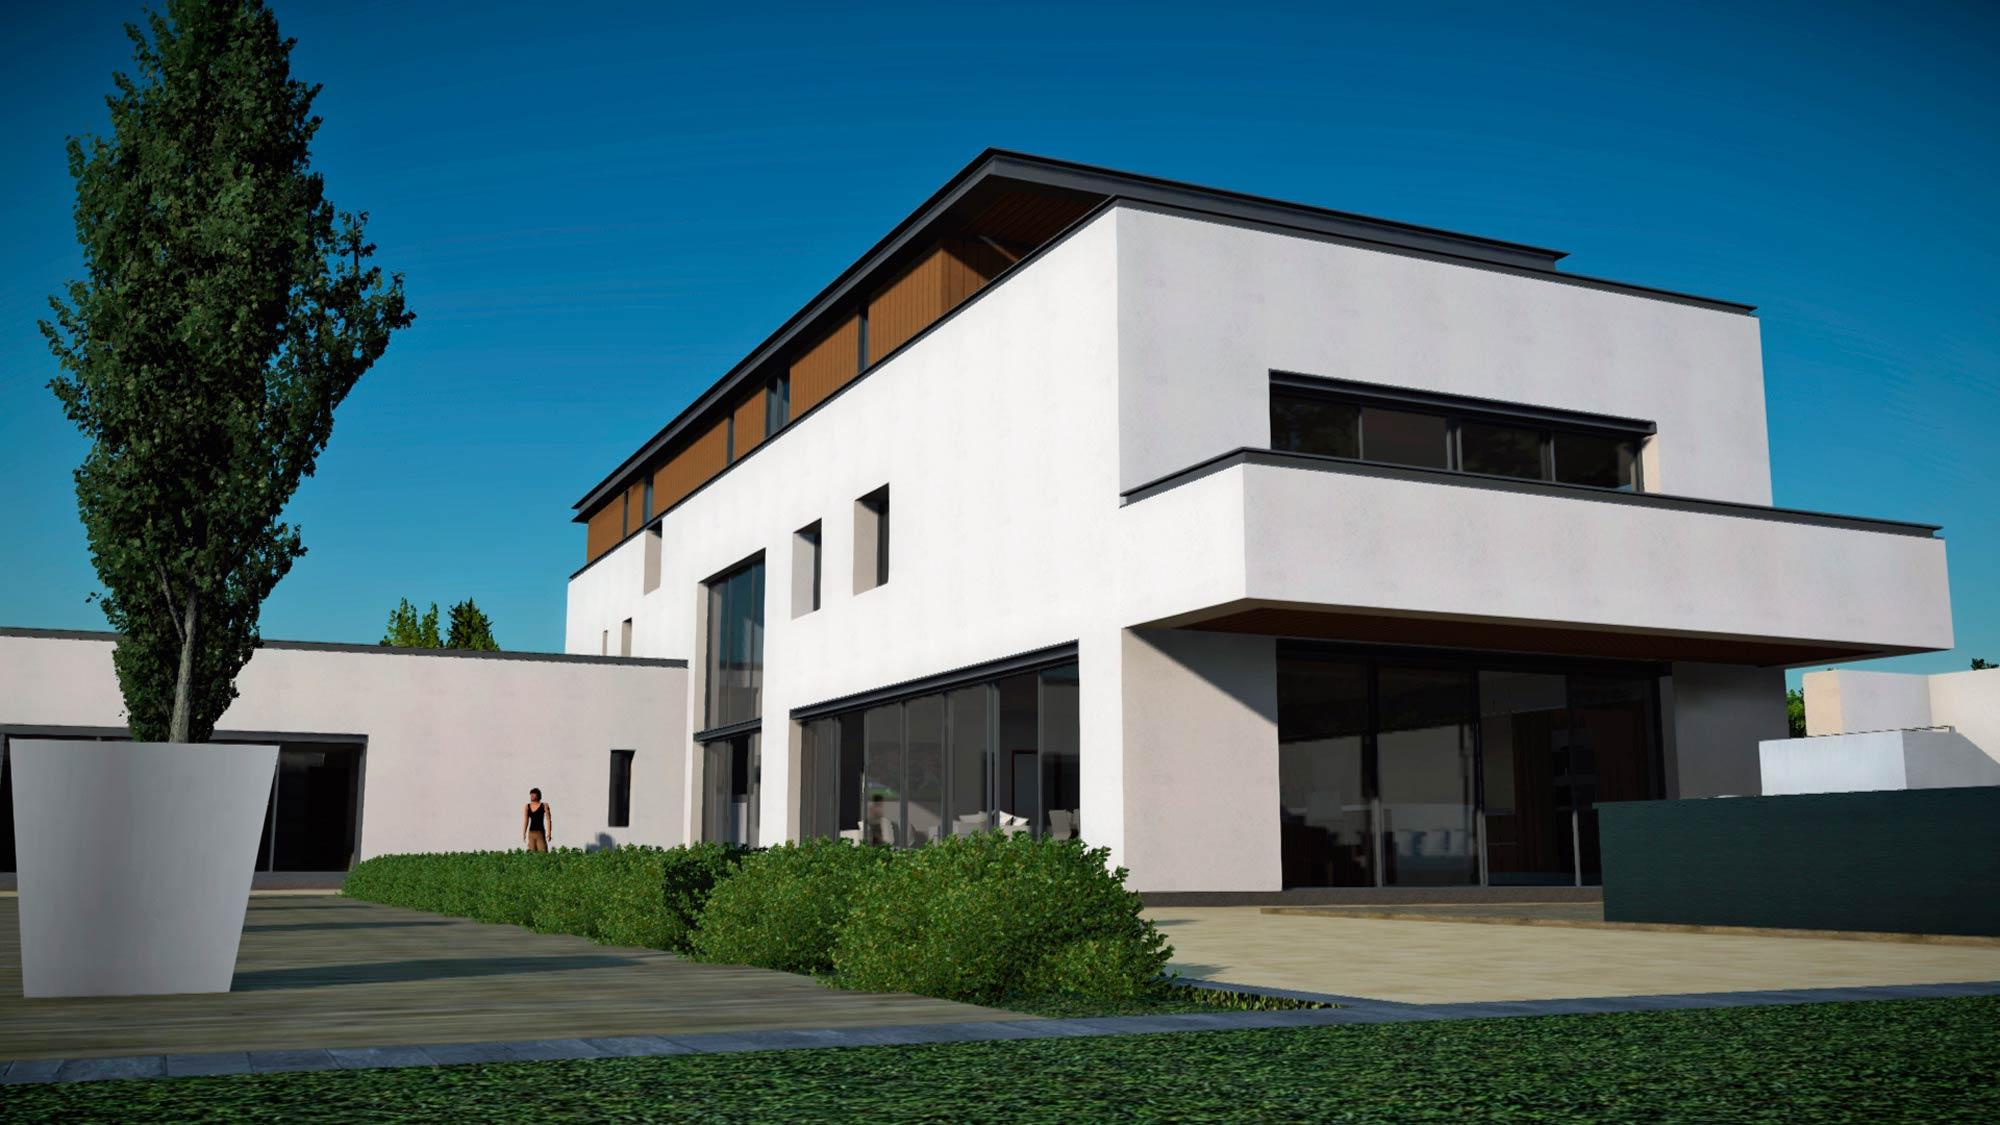 3 storey house white render